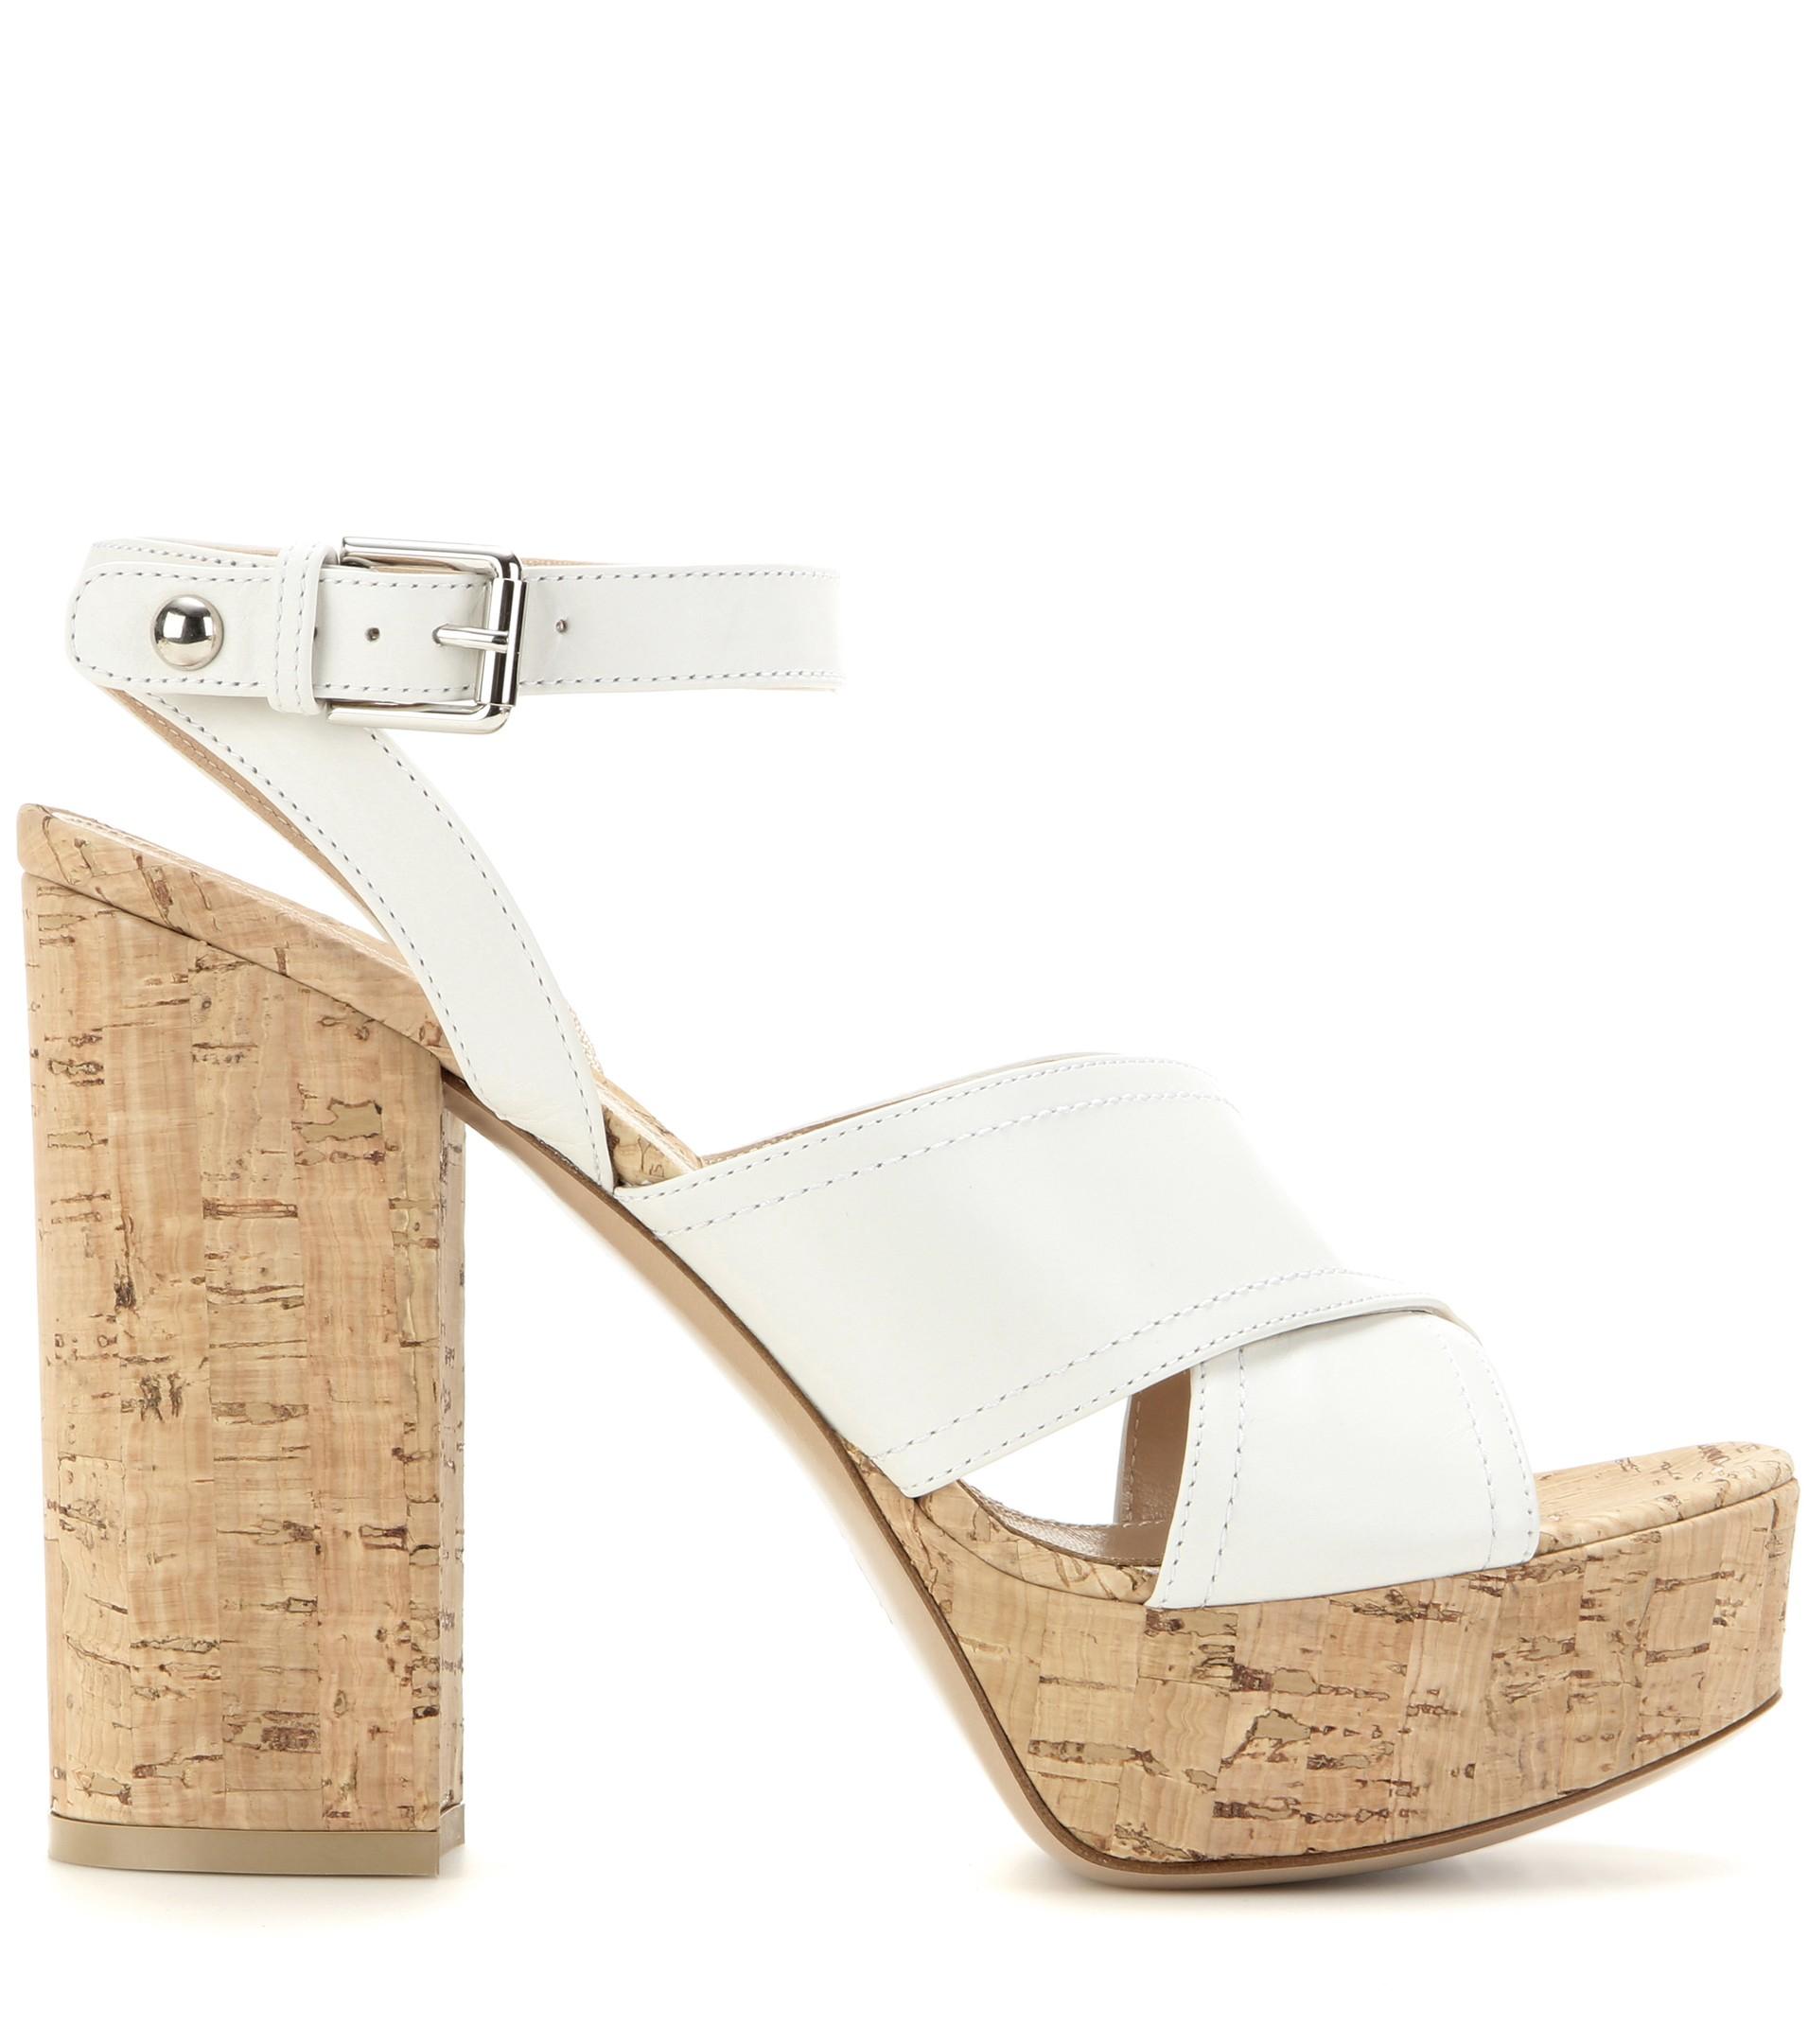 365ac2ba398 Gianvito Rossi Suzie Leather Platform Sandals in Natural - Lyst